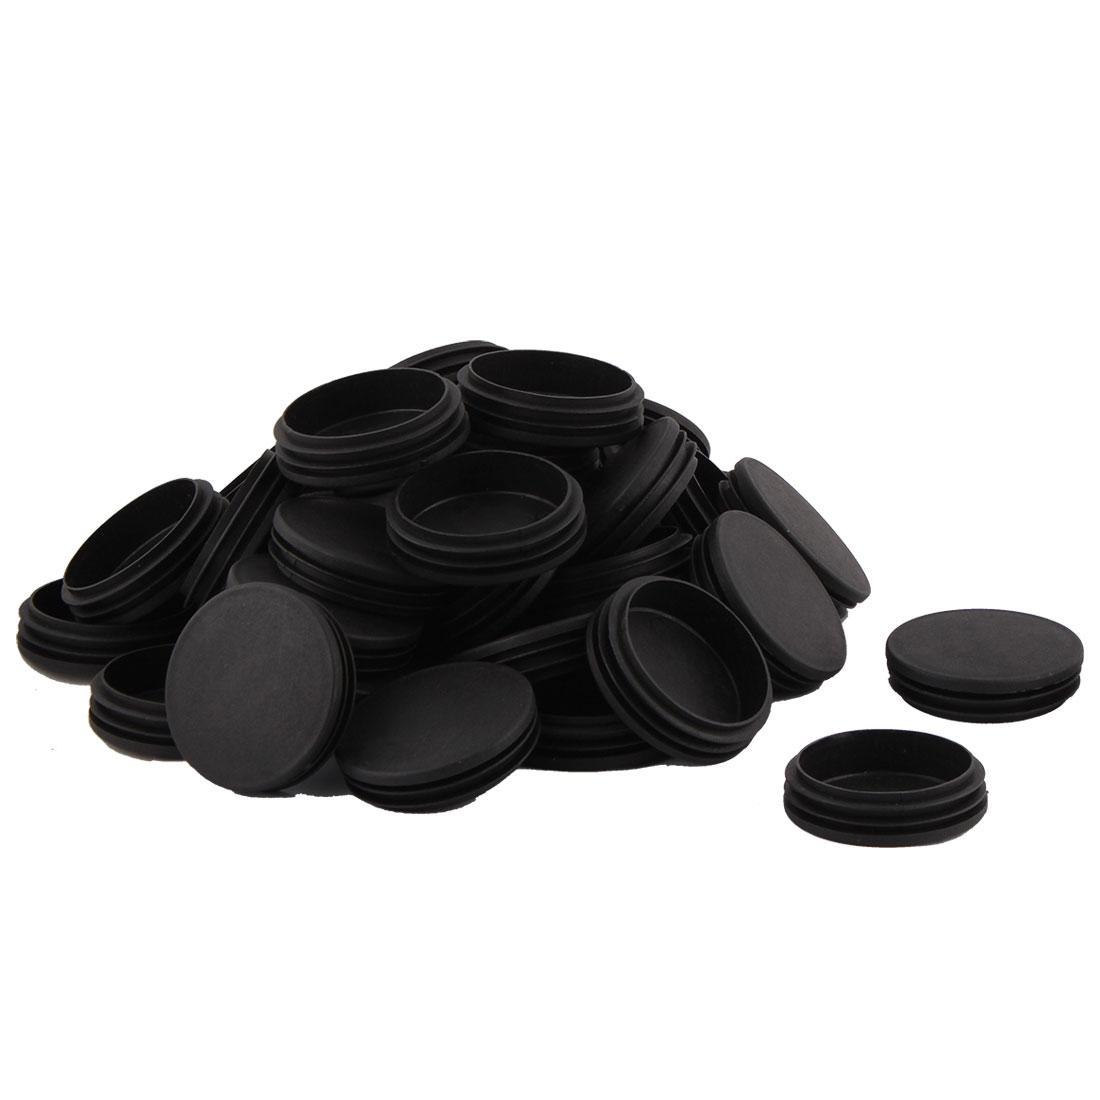 Office School Plastic Round Furniture Legs Protector Tube Insert Black Dia 70mm 40 Pcs